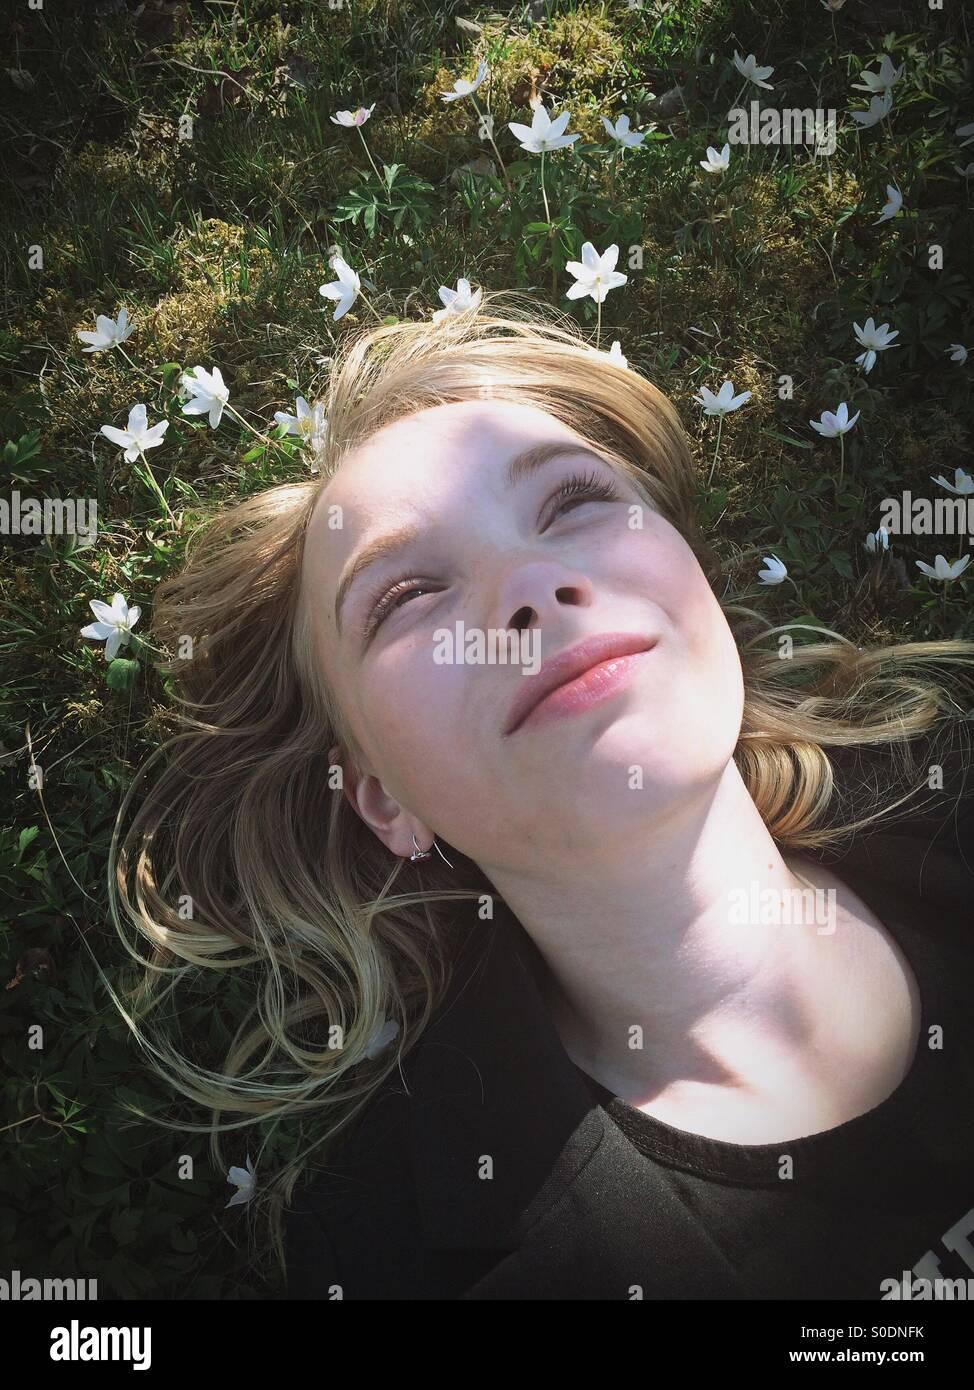 Enjoy the spring sun - Stock Image